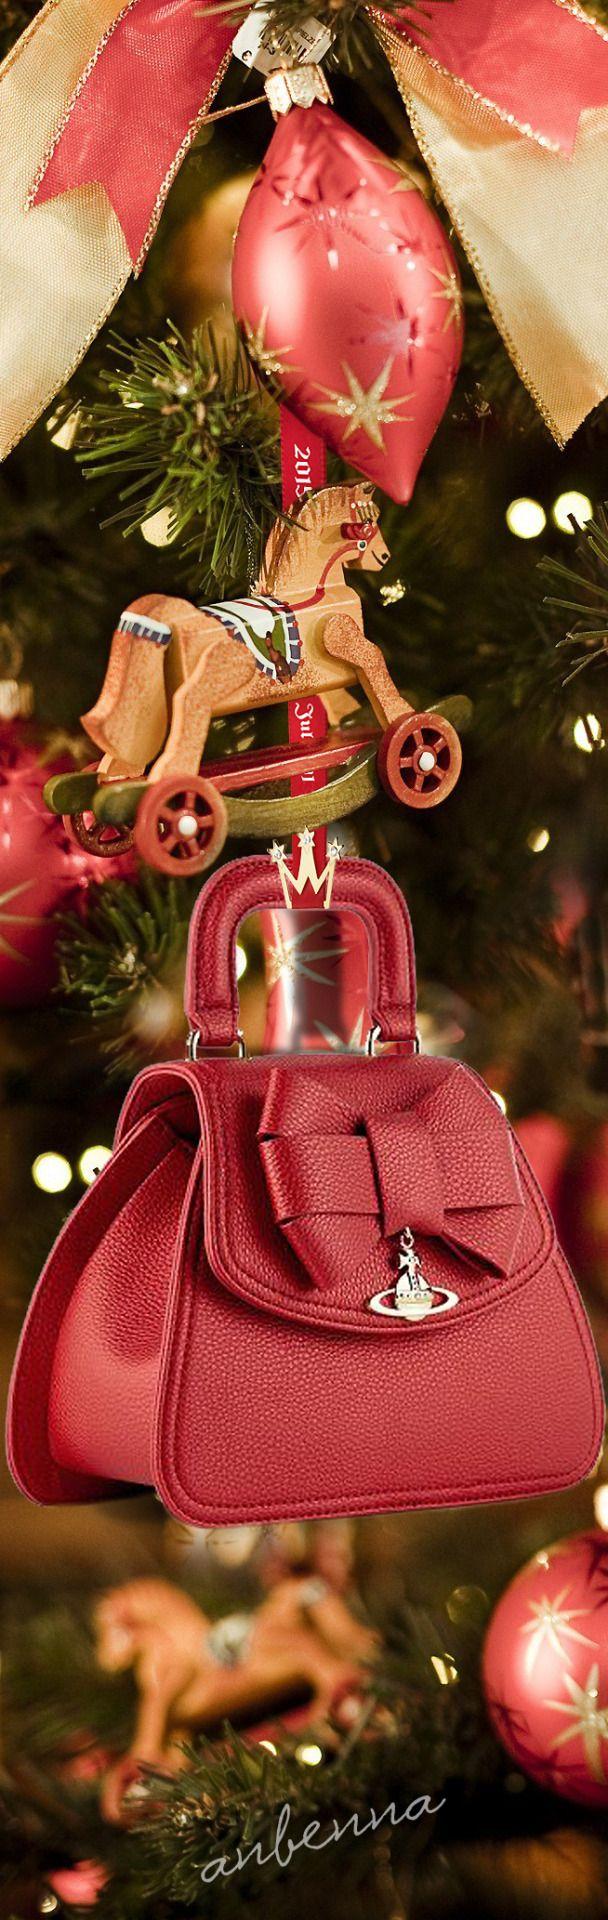 Vivienne Westwood Small Bow Handbag